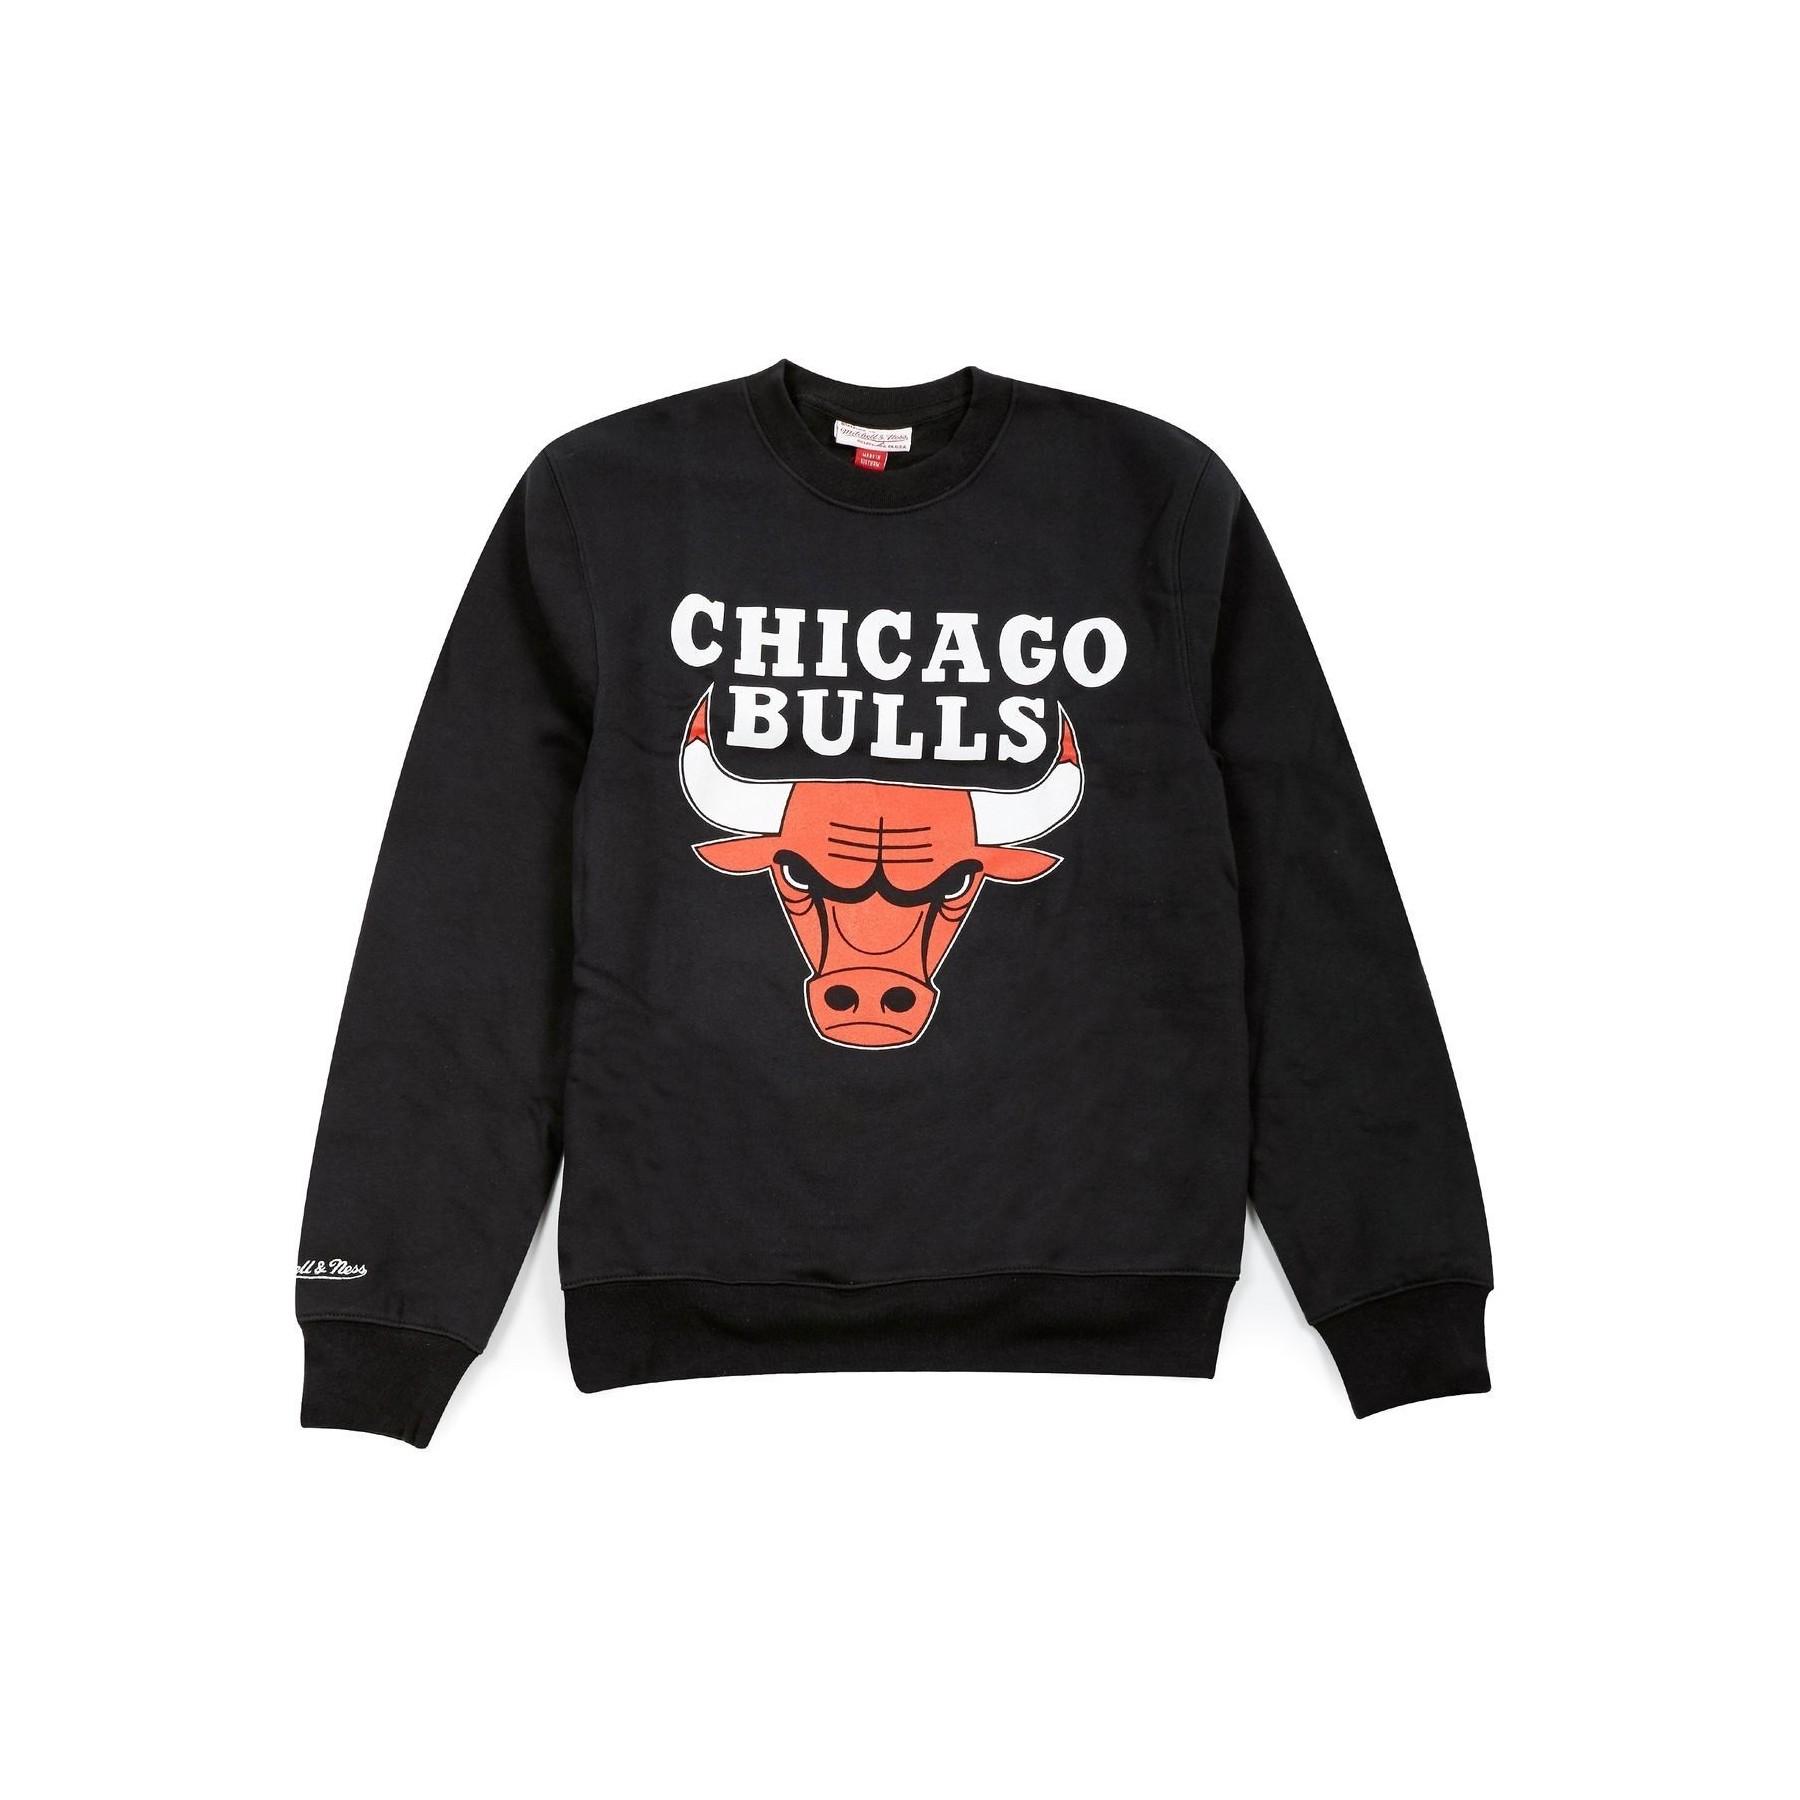 miglior valore 36de6 1e7c3 FELPA GIROCOLLO CHICAGO BULLS TEAM LOGO CREW NERO | Atipicishop.com